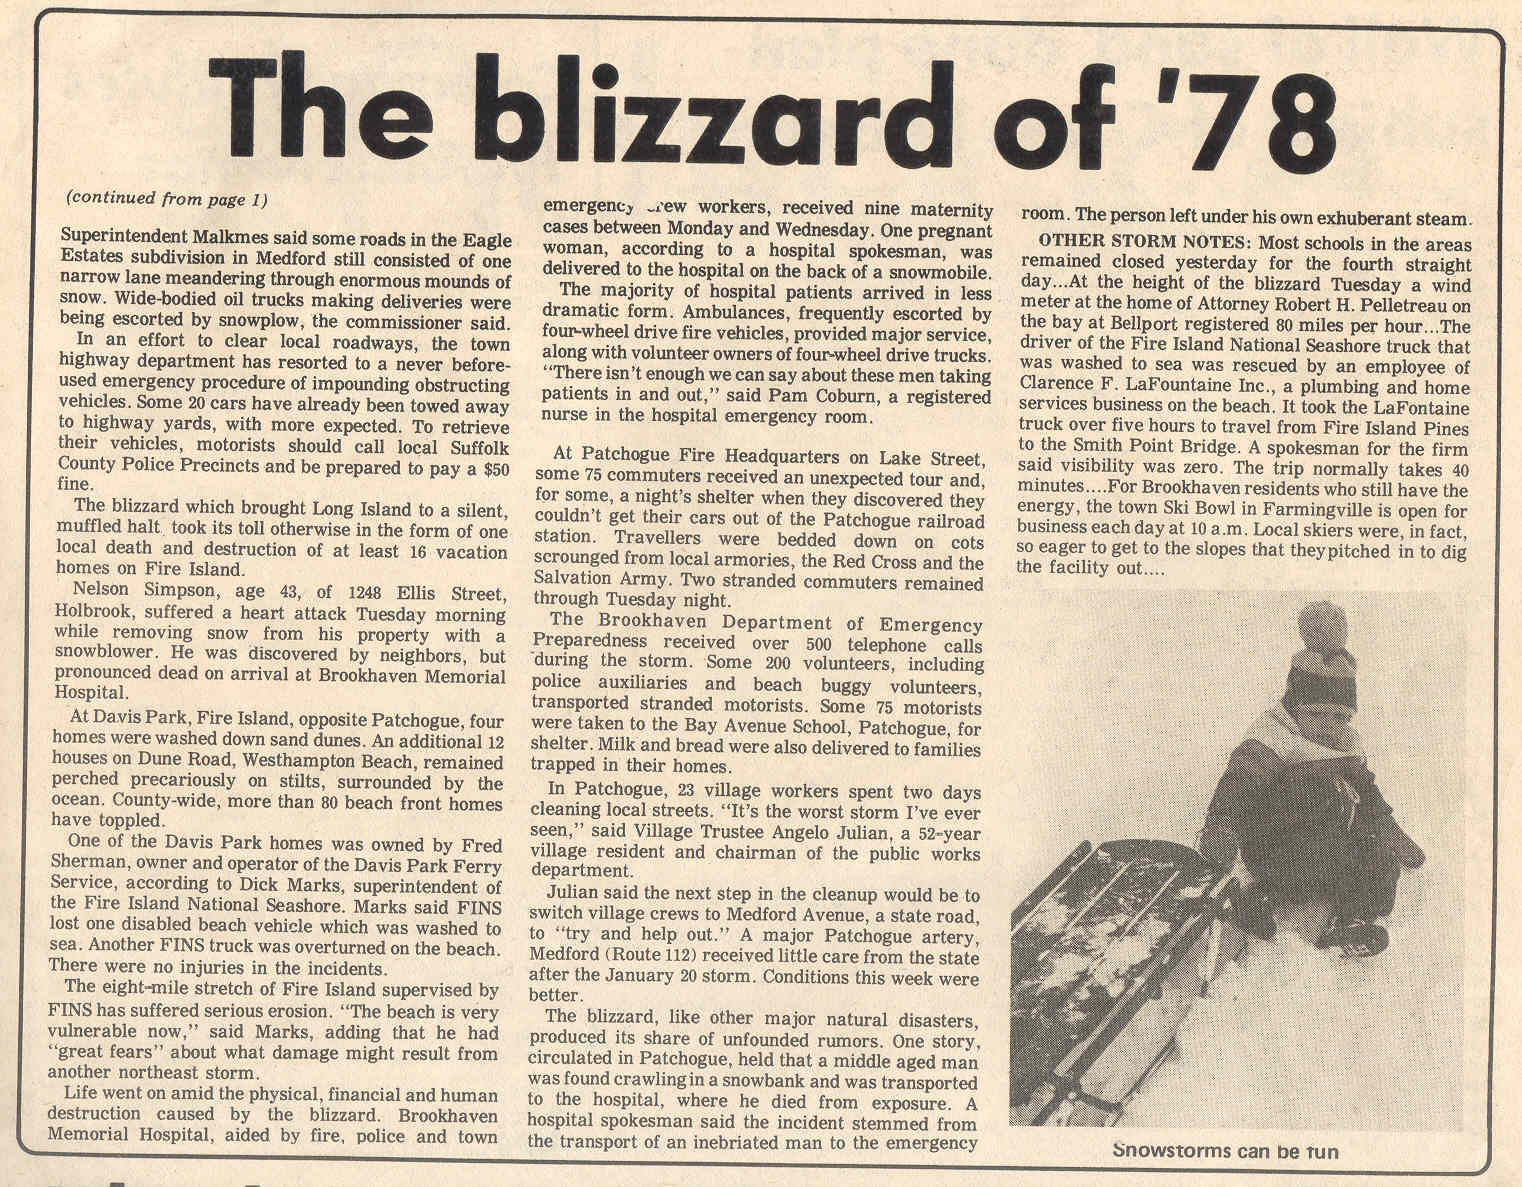 1978 news articles